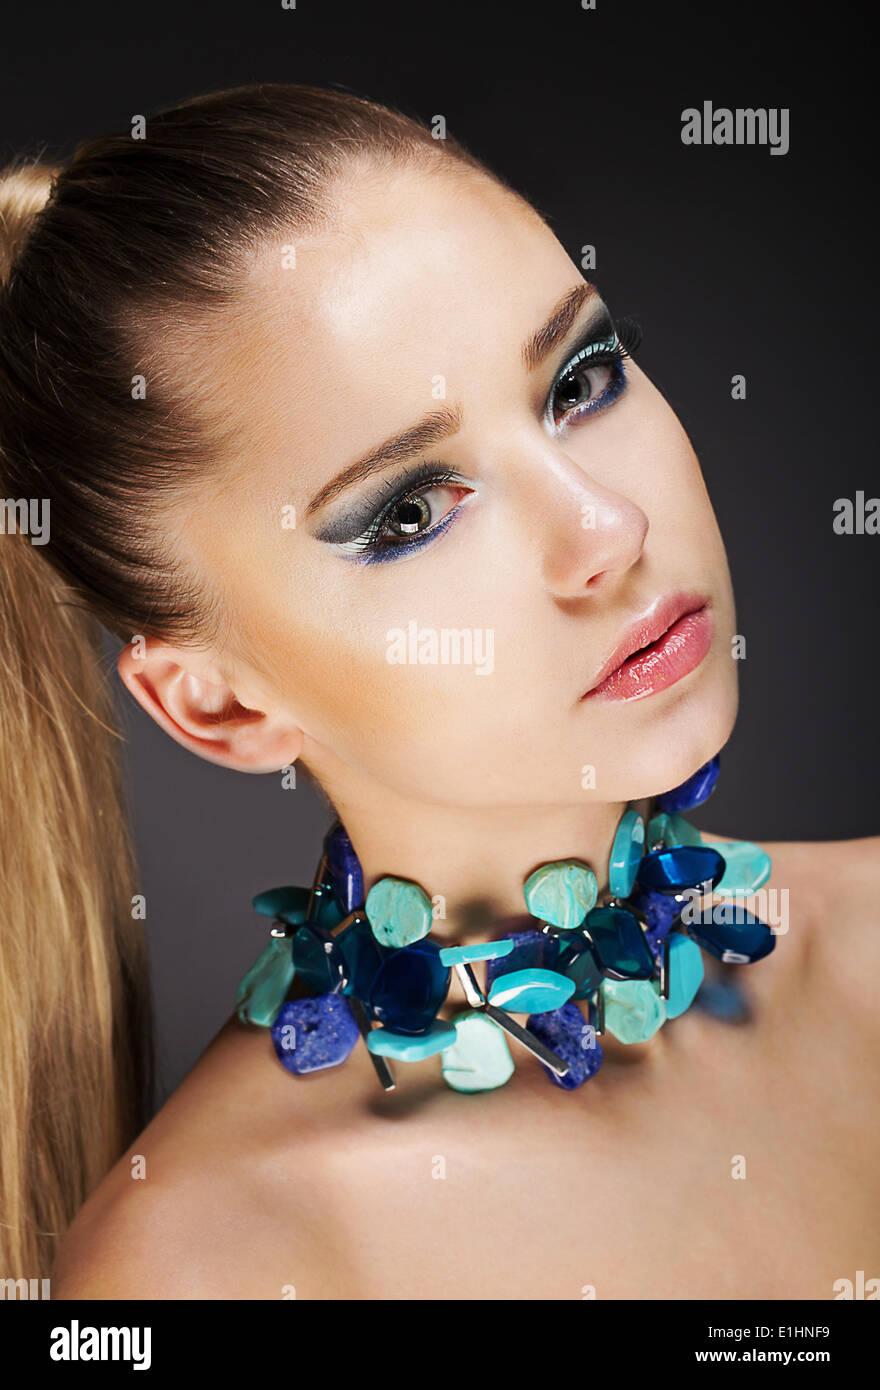 Glamor. Romantic Elegant Girl with Accessories. Gemstones Beads - Stock Image